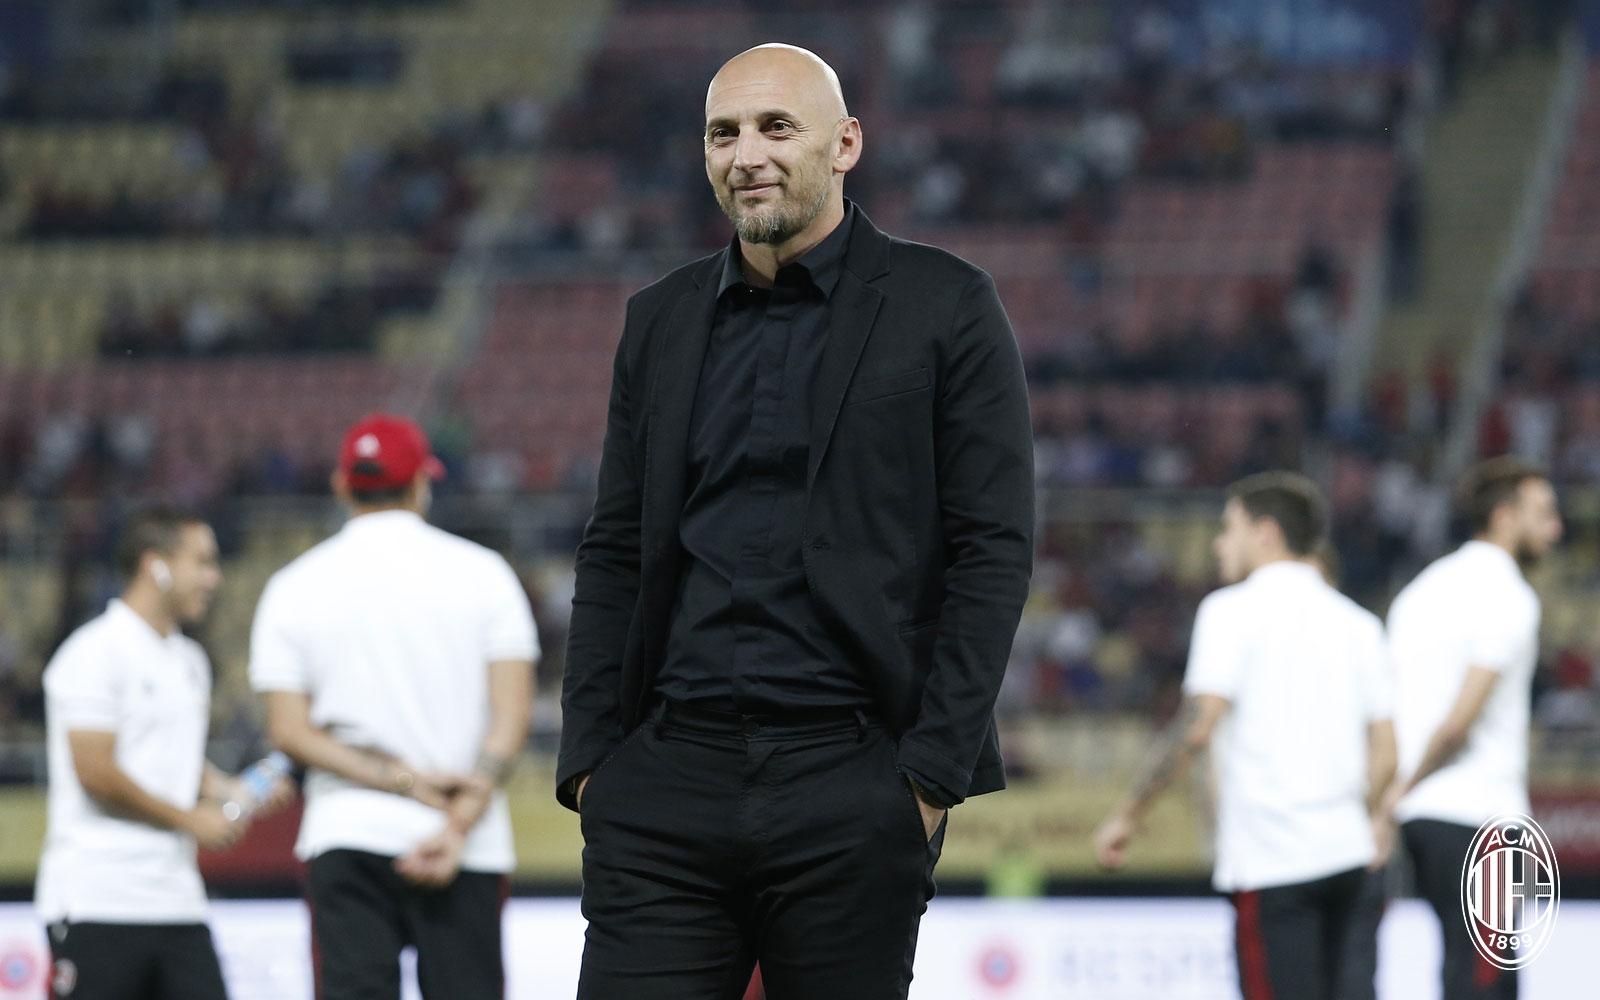 Christian Abbiati before Shkëndija-Milan Milan at the Philip II Arena on the 24th of August, 2017. (@acmilan.com)